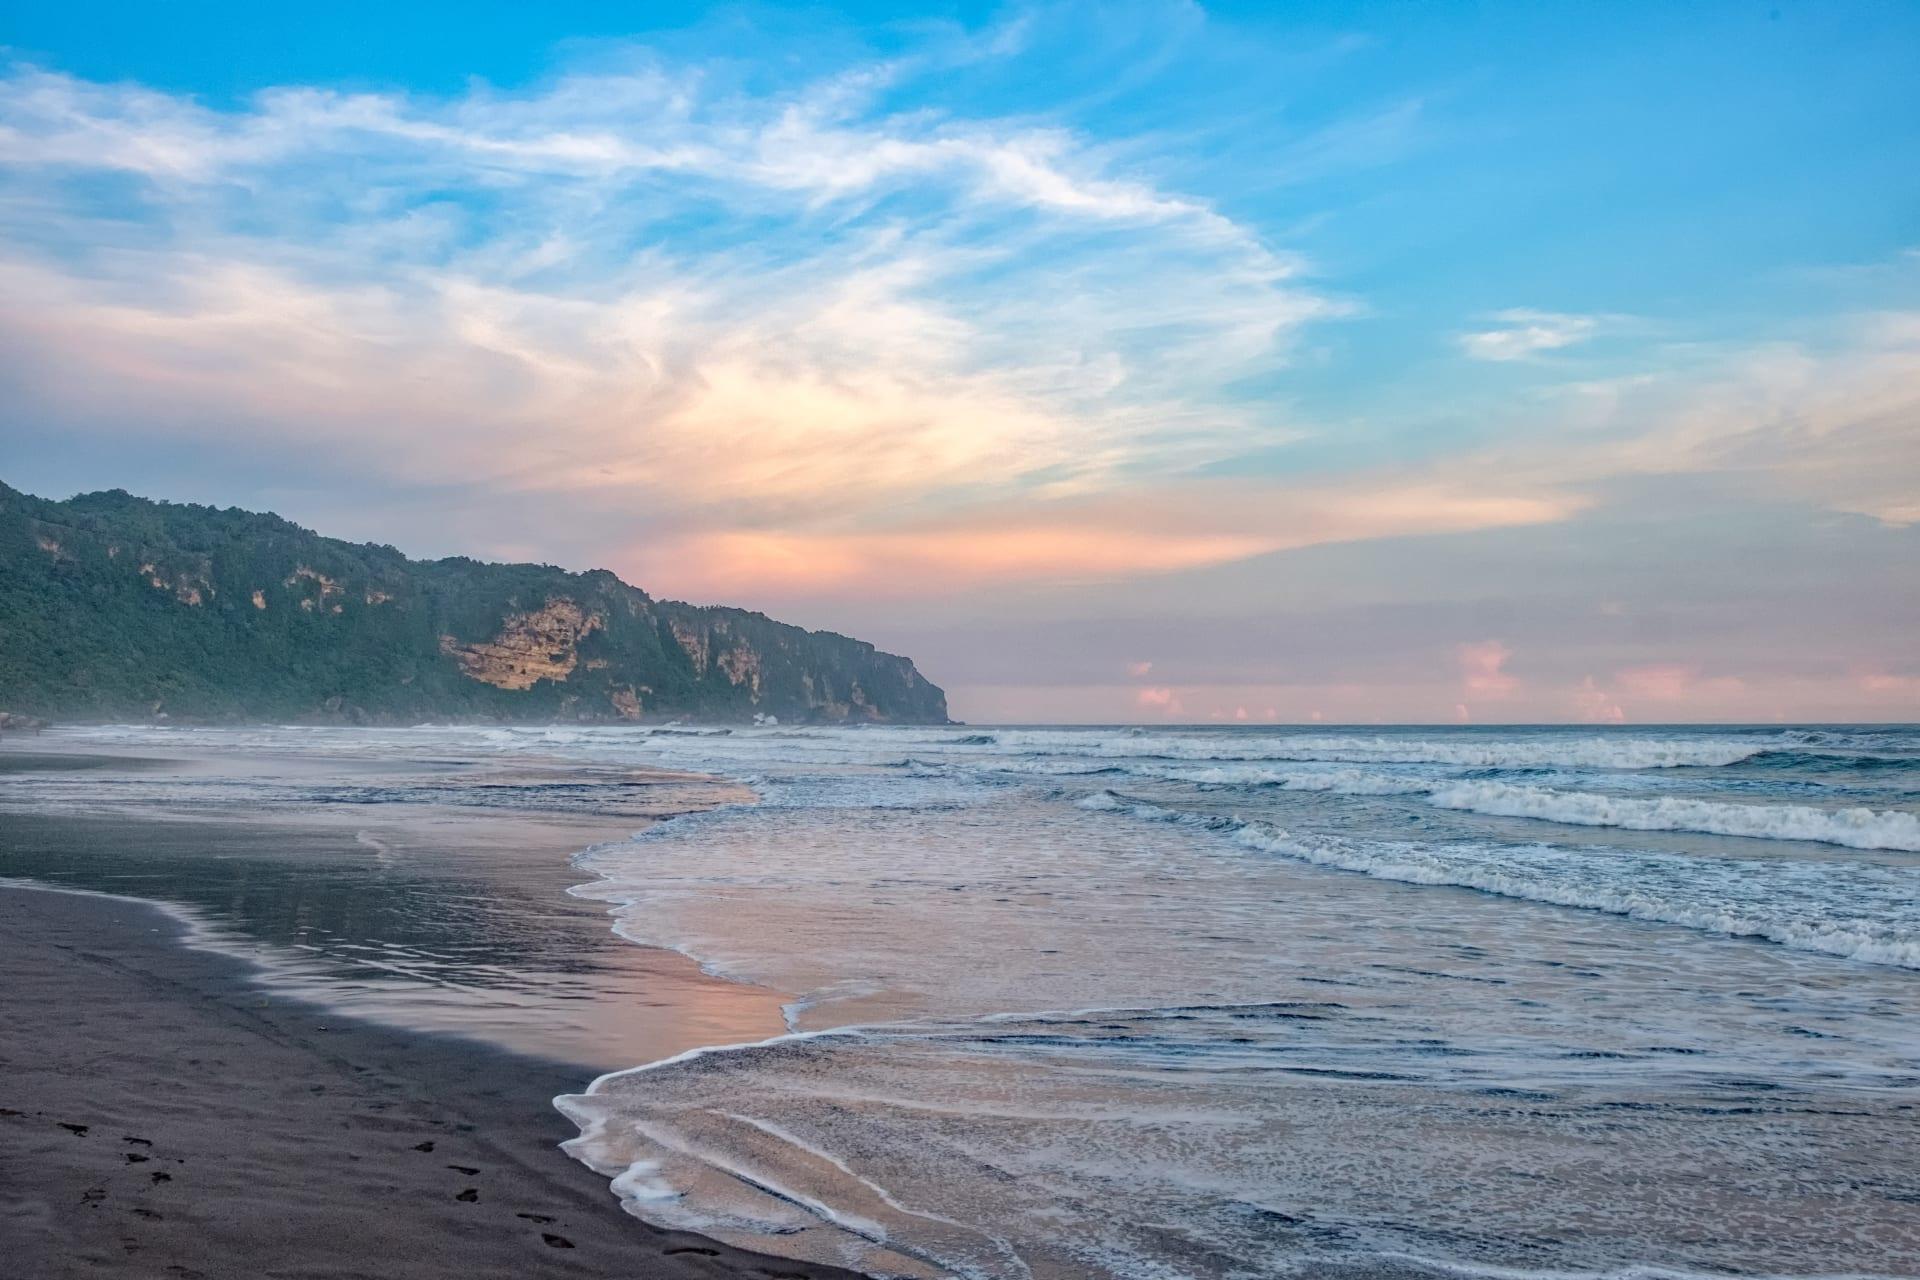 Yogyakarta - Sunset at Mystical Beach of Parangtritis in Yogyakarta